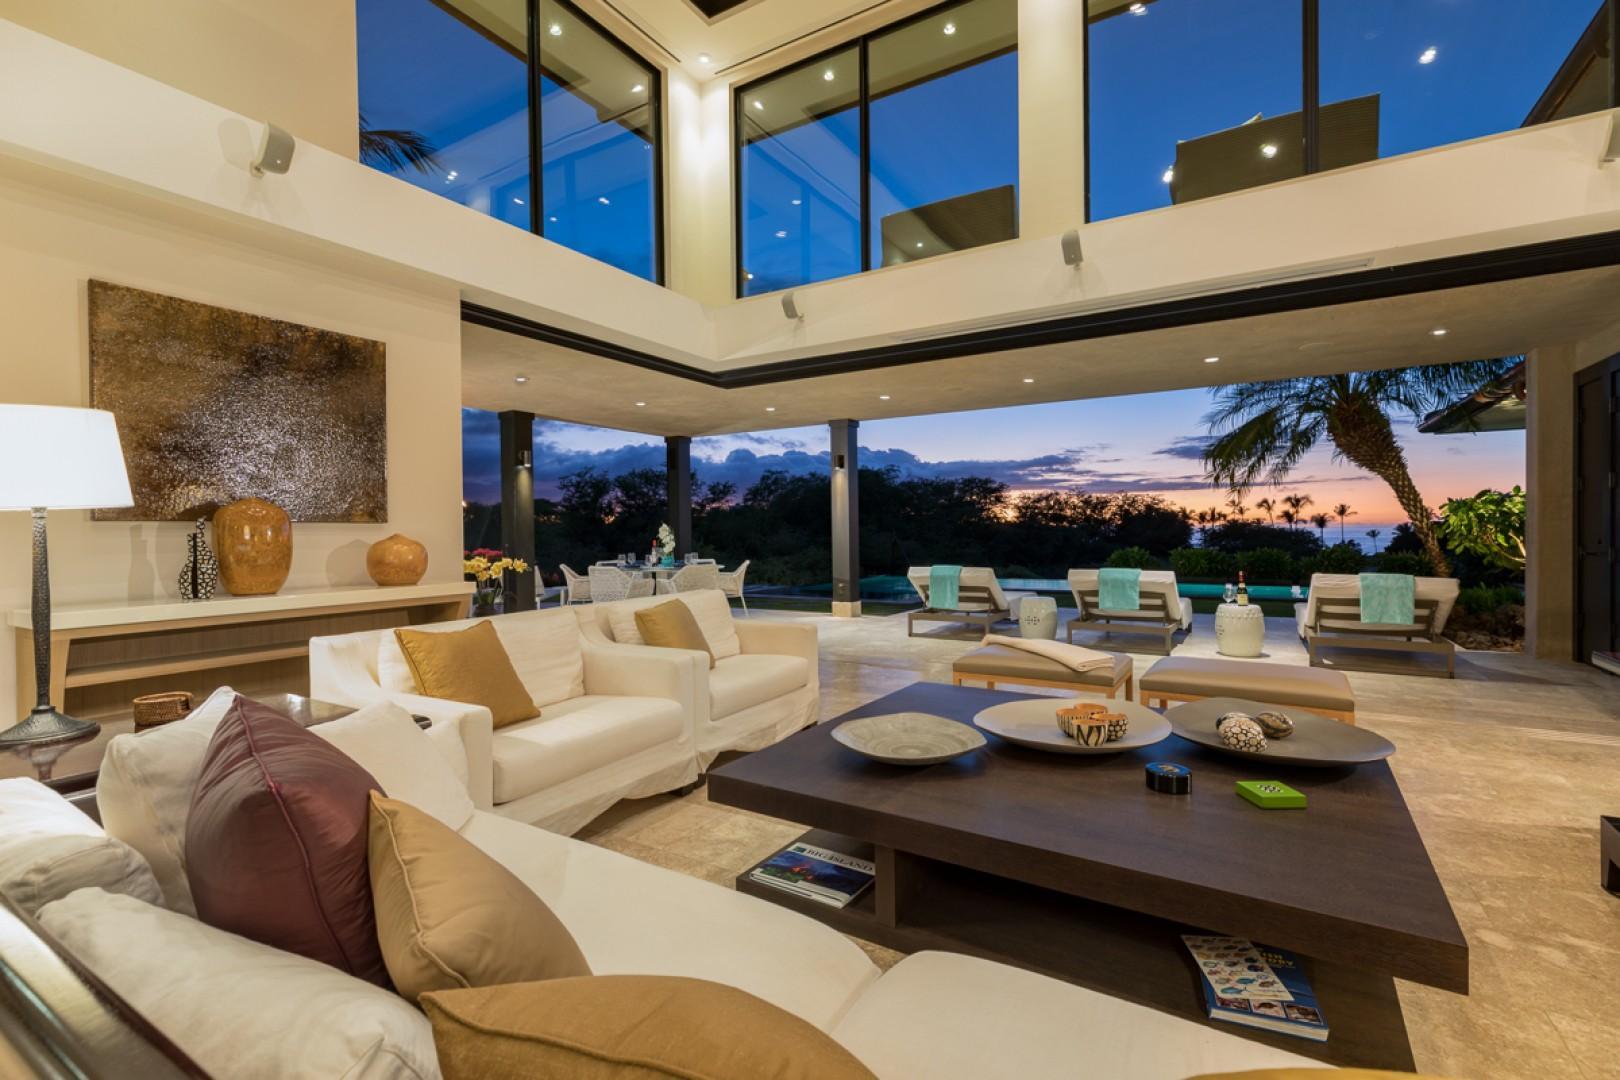 Unwind indoors in total luxury